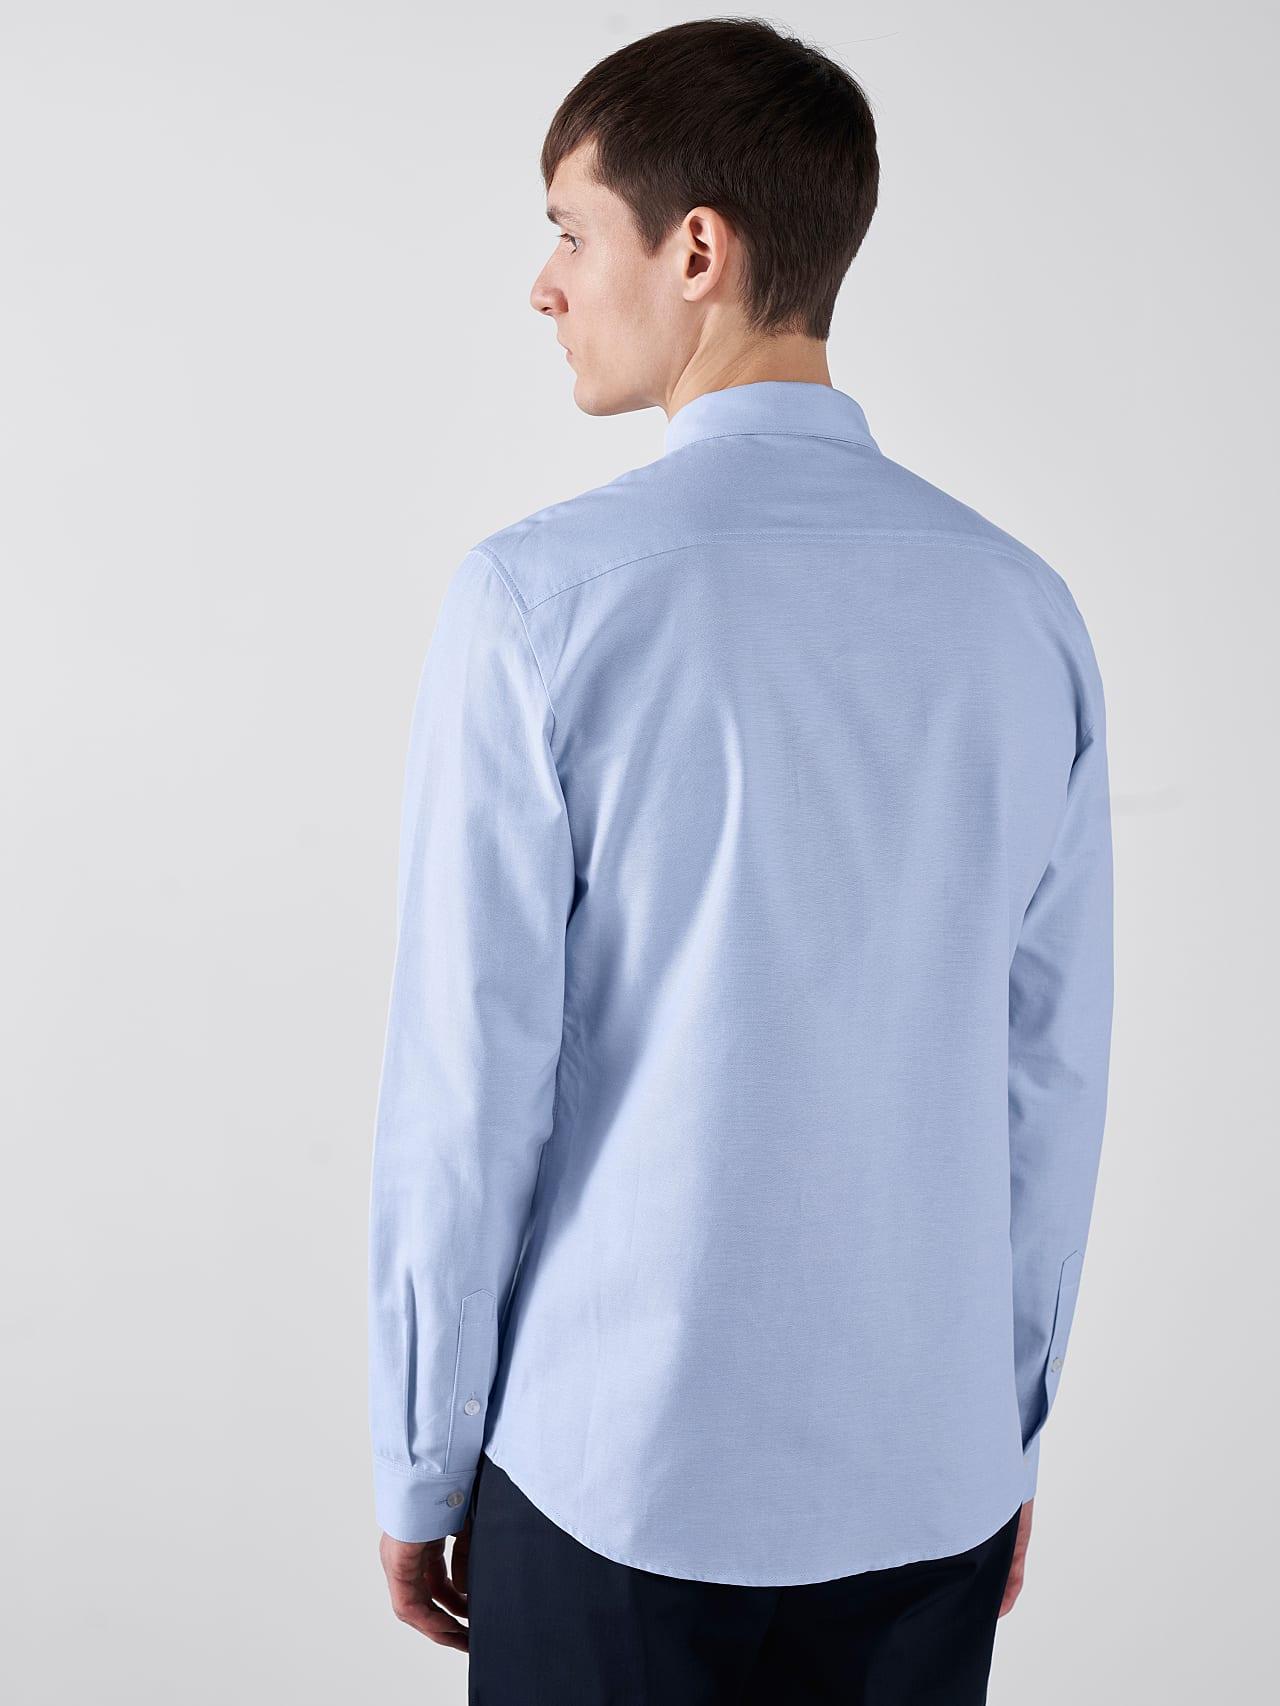 WOSKA V2.Y5.01 Kent Collar Oxford Shirt light blue Front Main Alpha Tauri